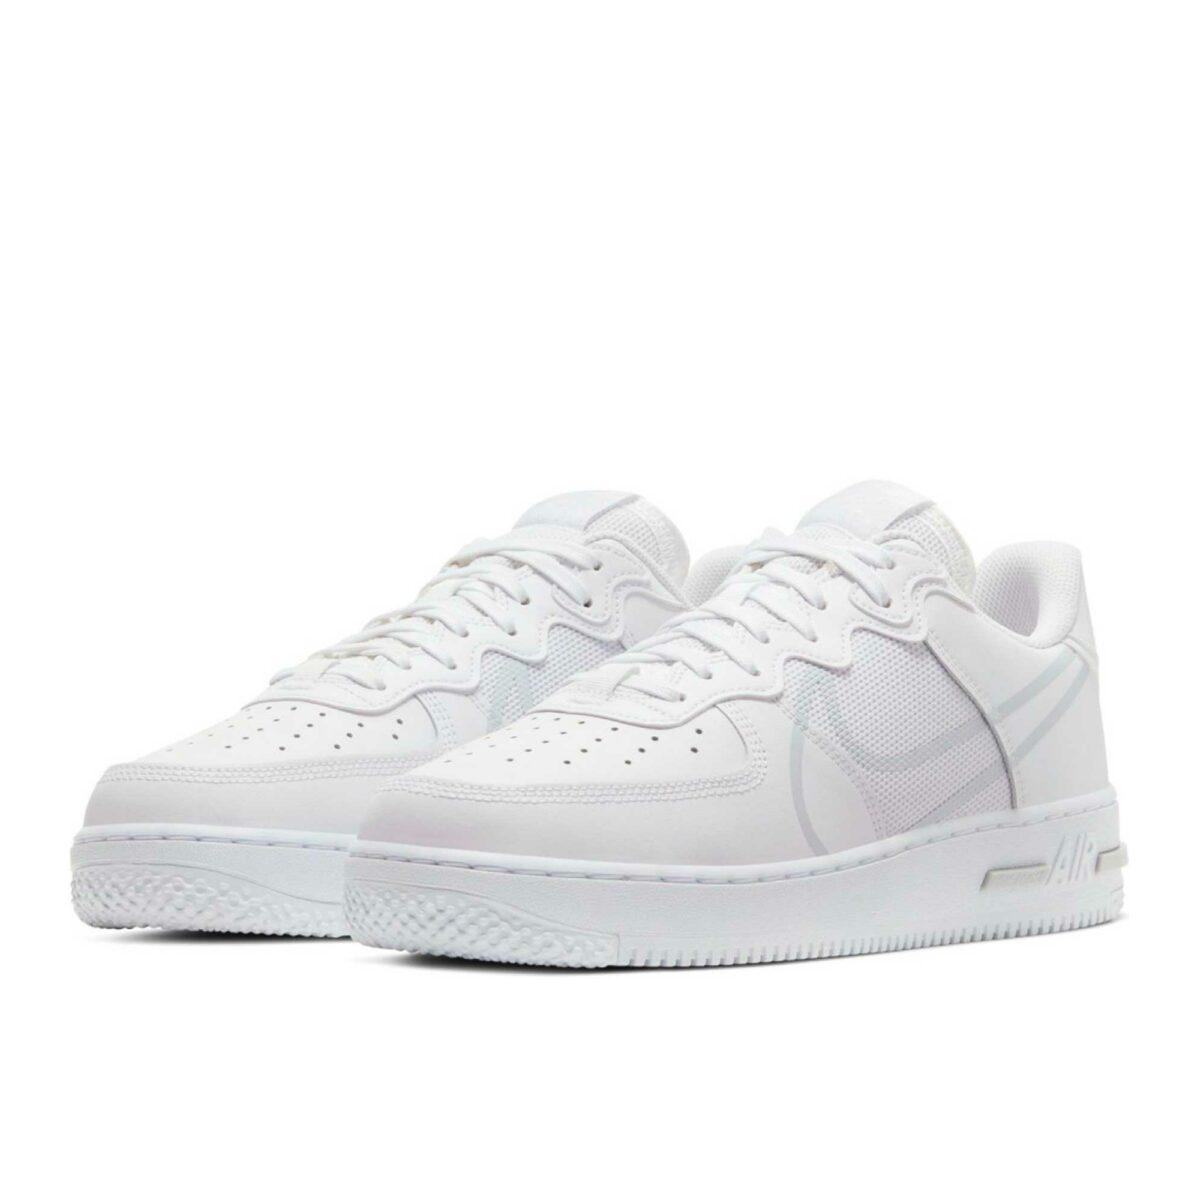 Nike Air Force 1 React white pure platinum CD4366_101 купить